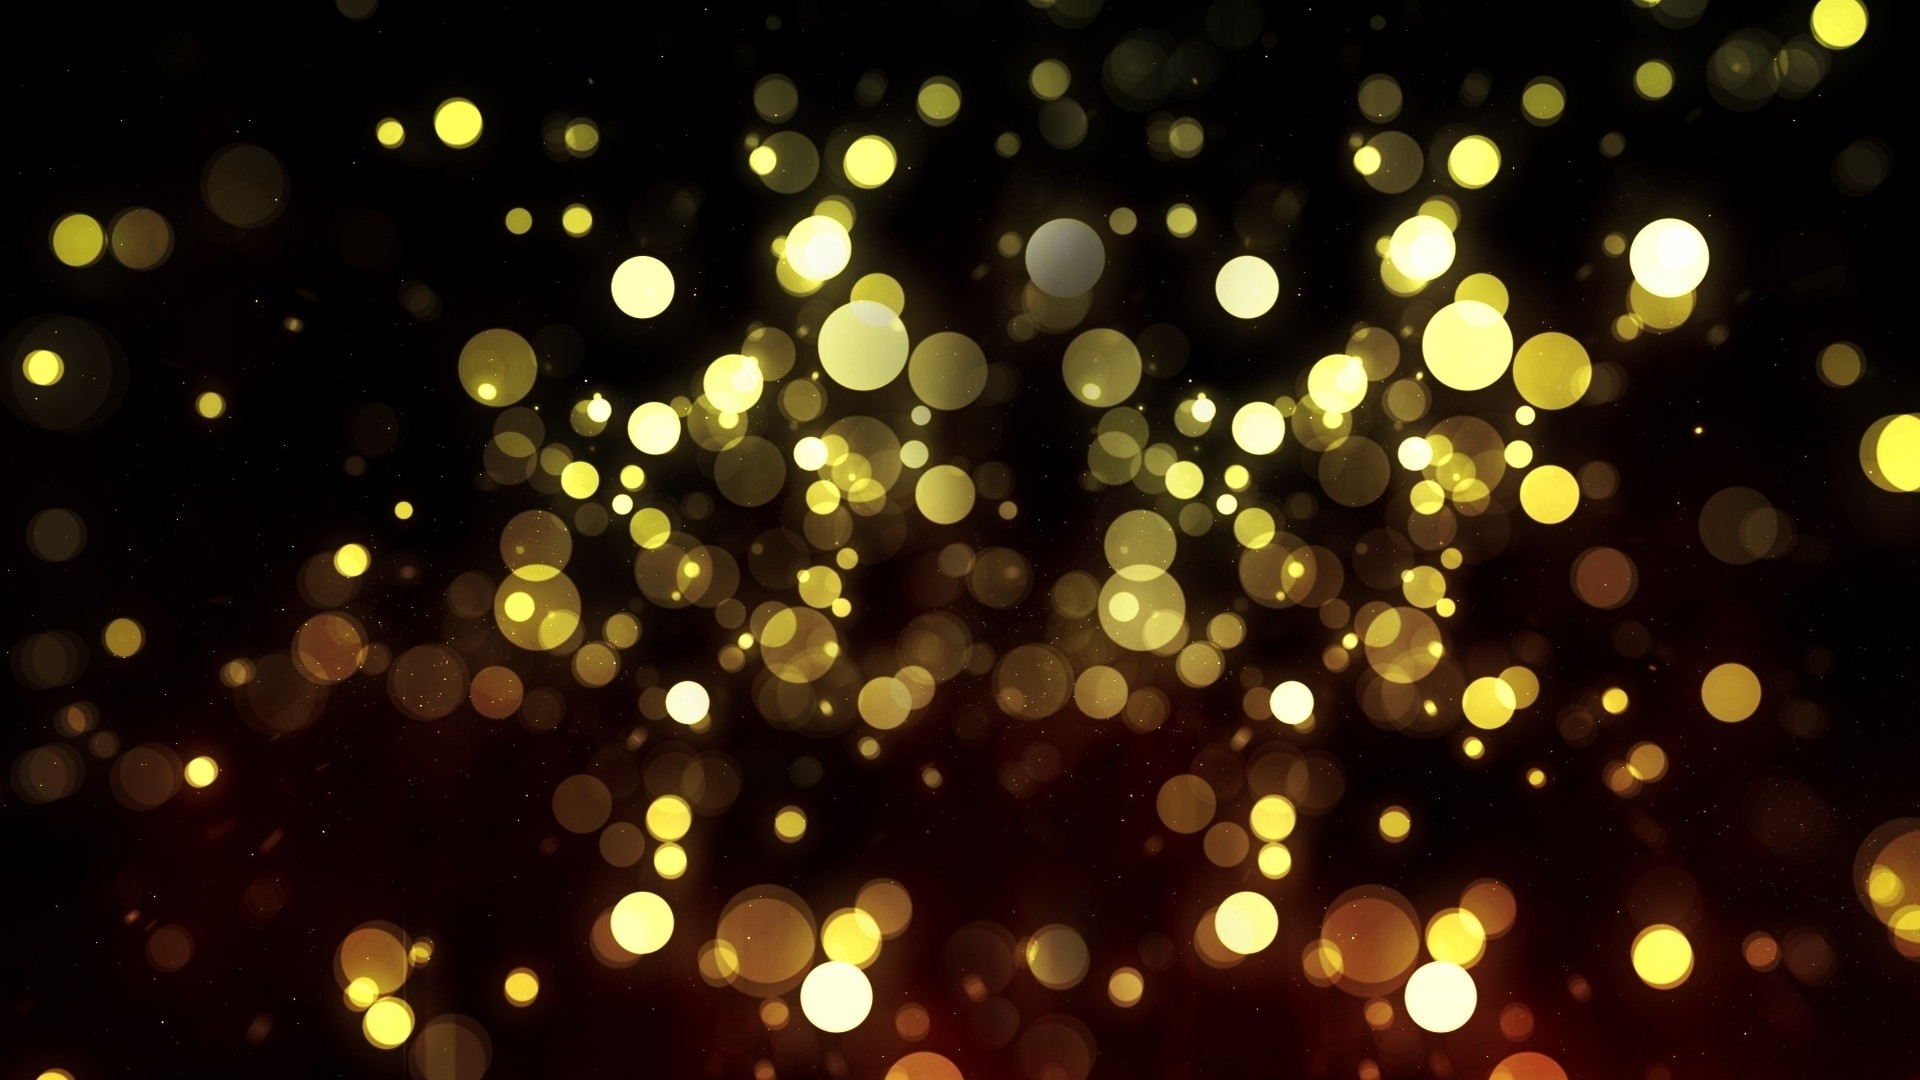 Res: 1920x1080, HD gold glitter wallpaper 1080p.